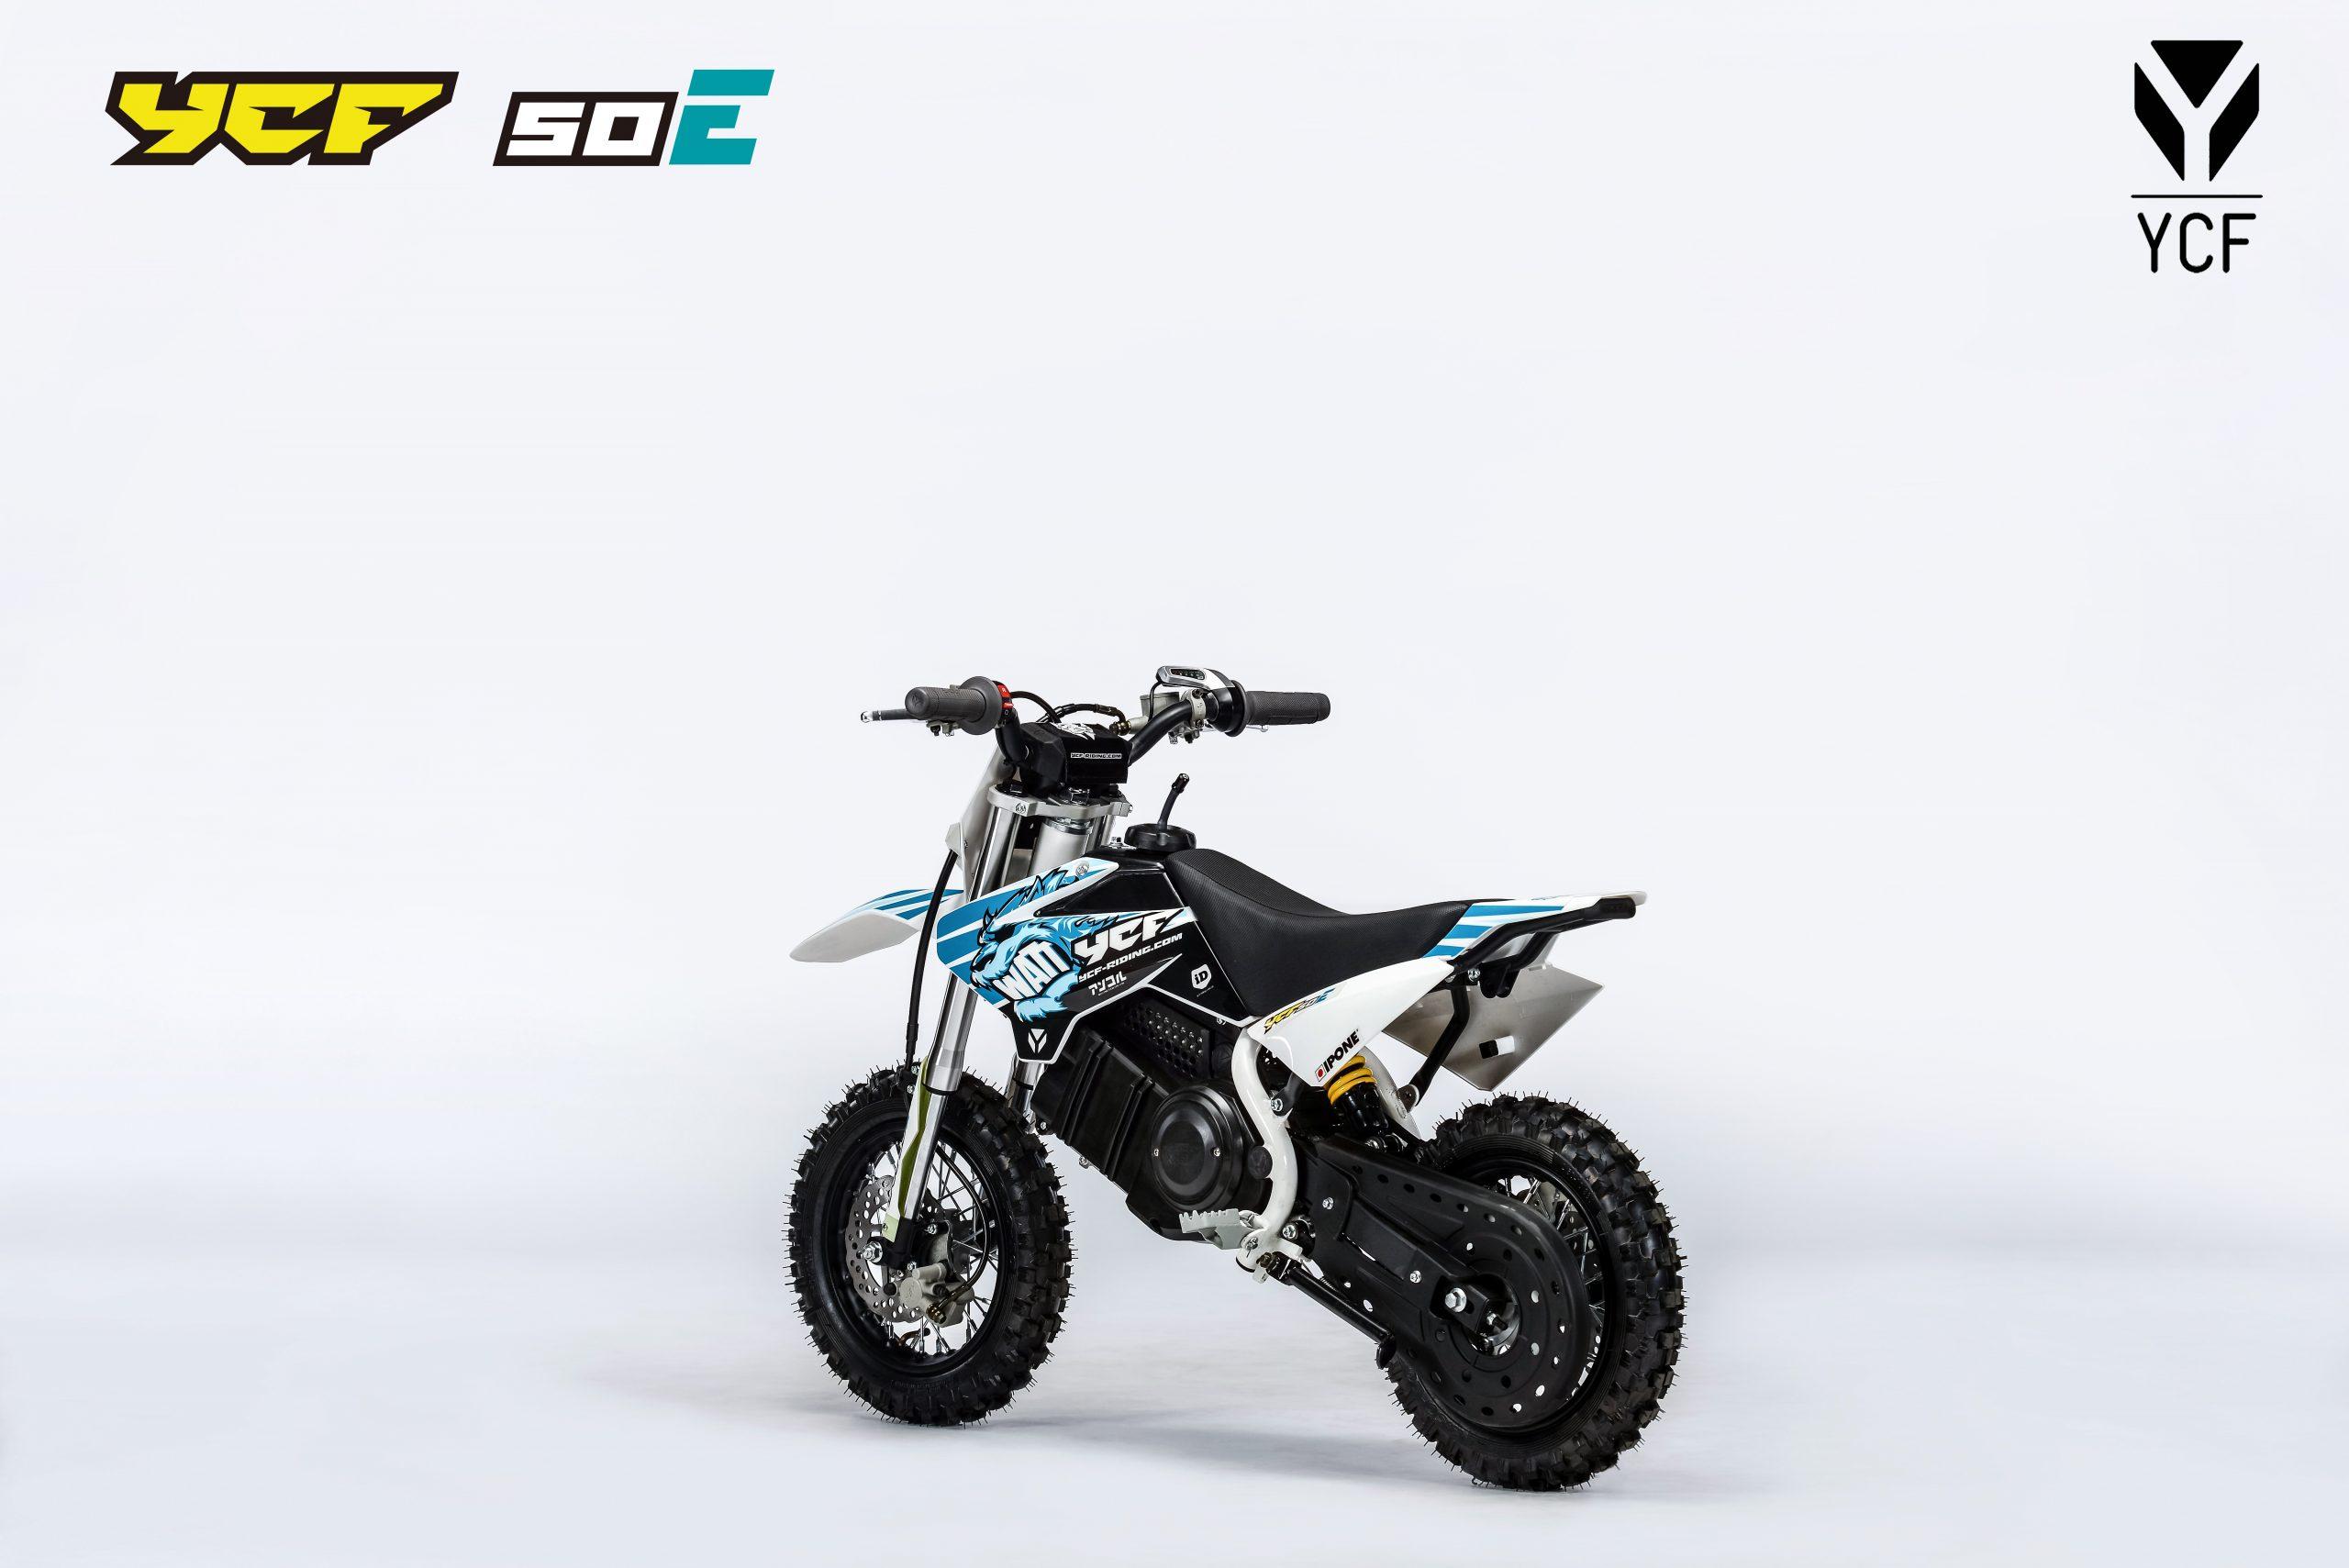 ПИТБАЙК YCF 50E 2021  Артмото - купить квадроцикл в украине и харькове, мотоцикл, снегоход, скутер, мопед, электромобиль